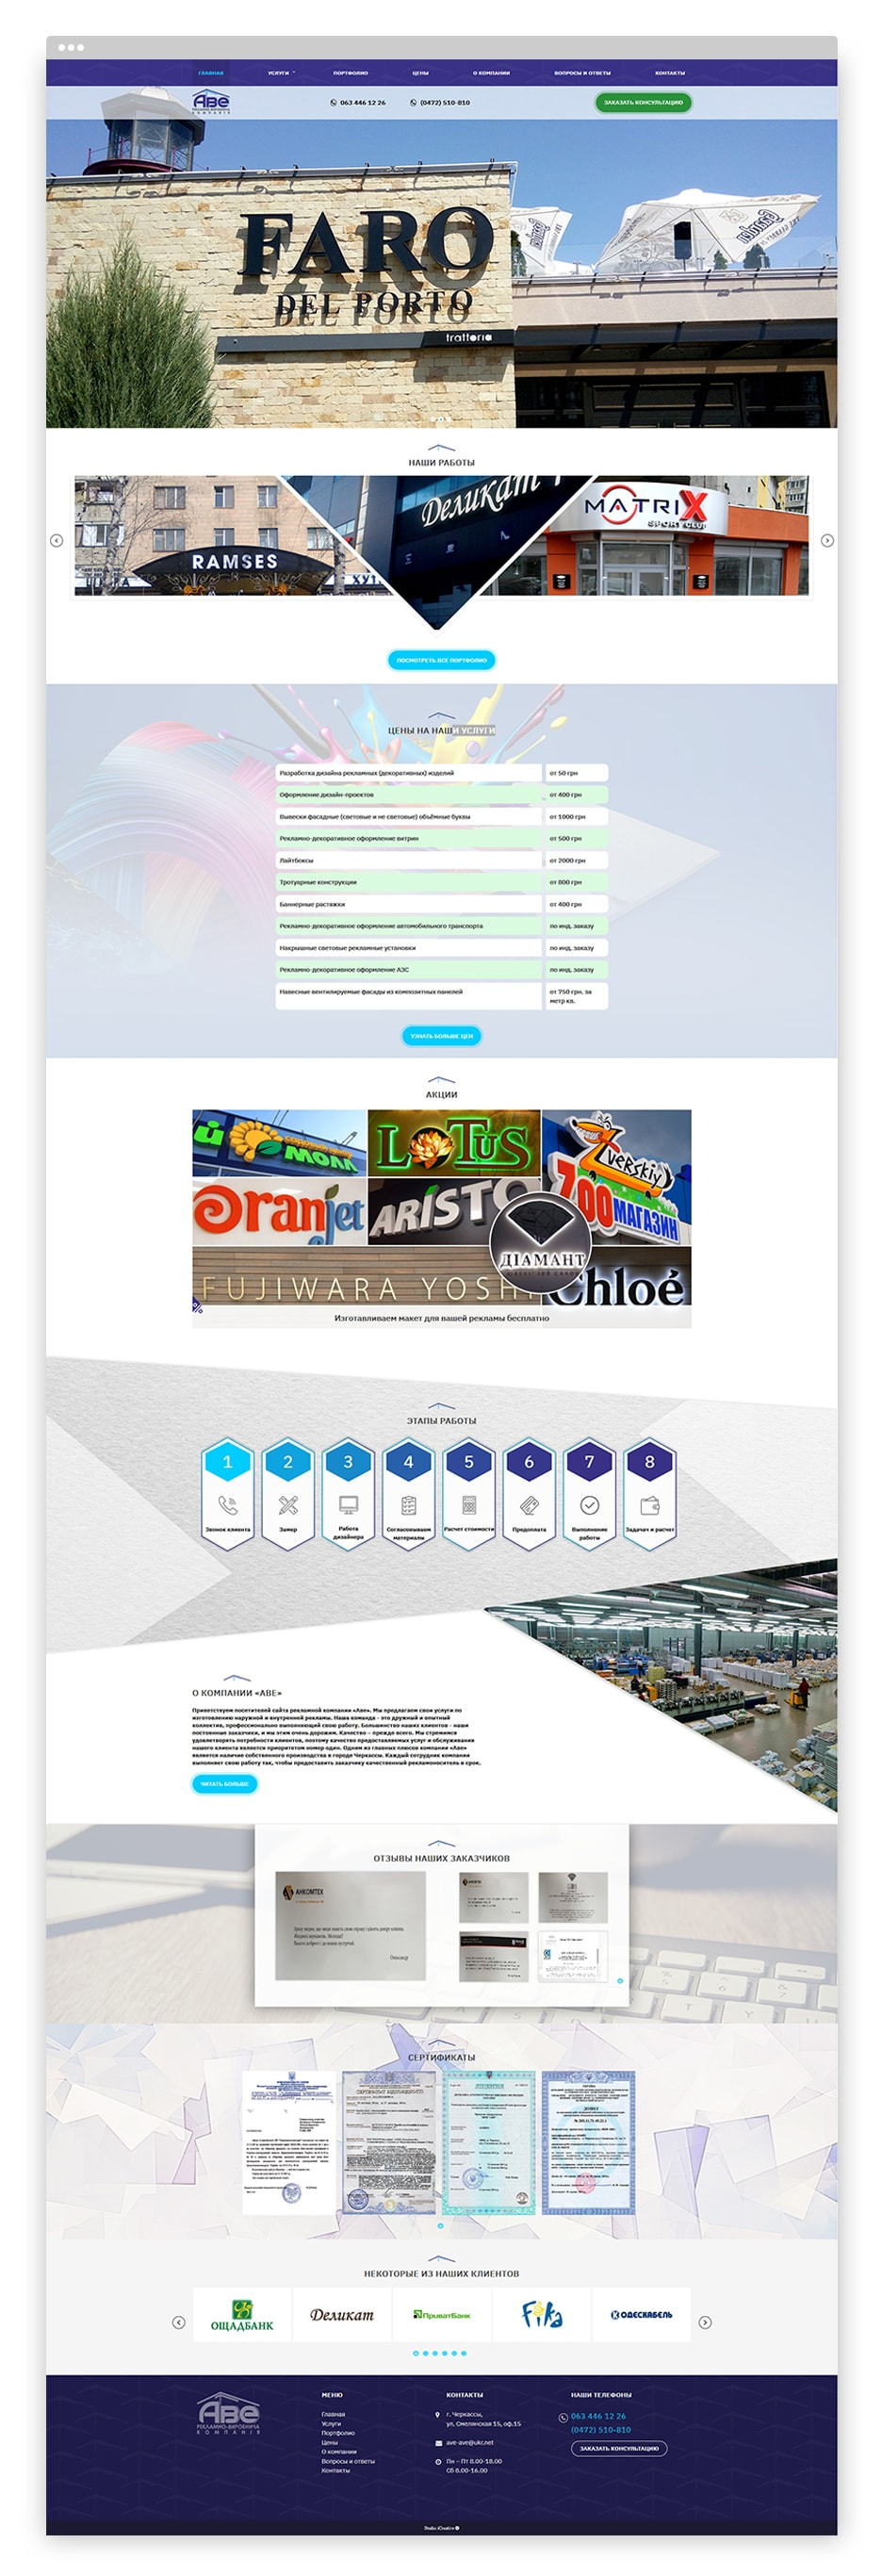 icreative.com.ua_ave_portfolio_1